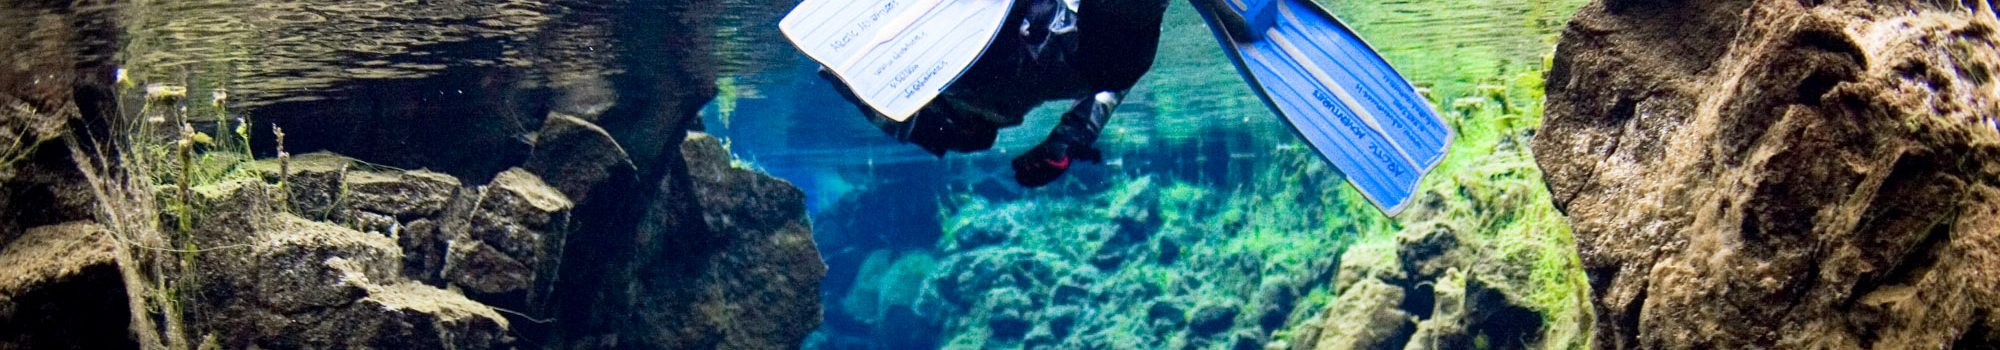 Snorkeling-tour-Silfra-Thingvellir-Iceland